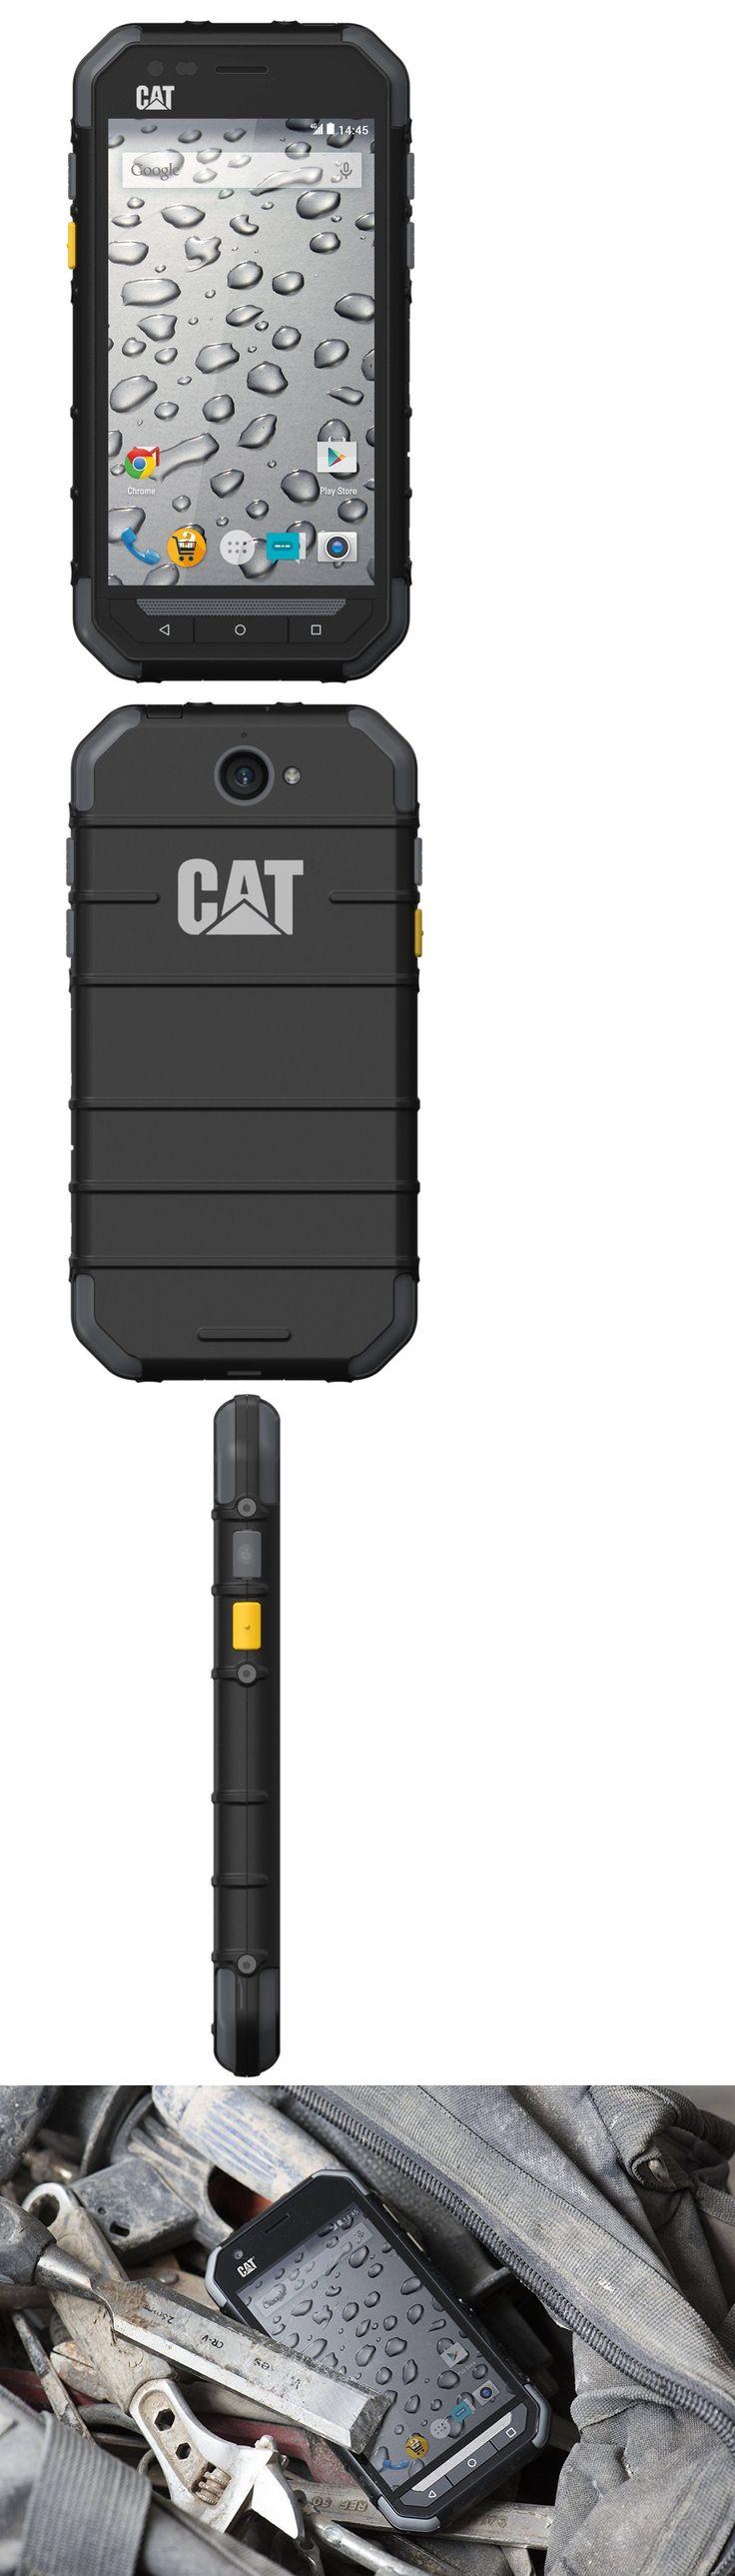 cell phones: Caterpillar Latam Cat S30 Smartphone Waterproof 8Gb Unlocked Gsm Phone Dual Sim -> BUY IT NOW ONLY: $199.99 on eBay!